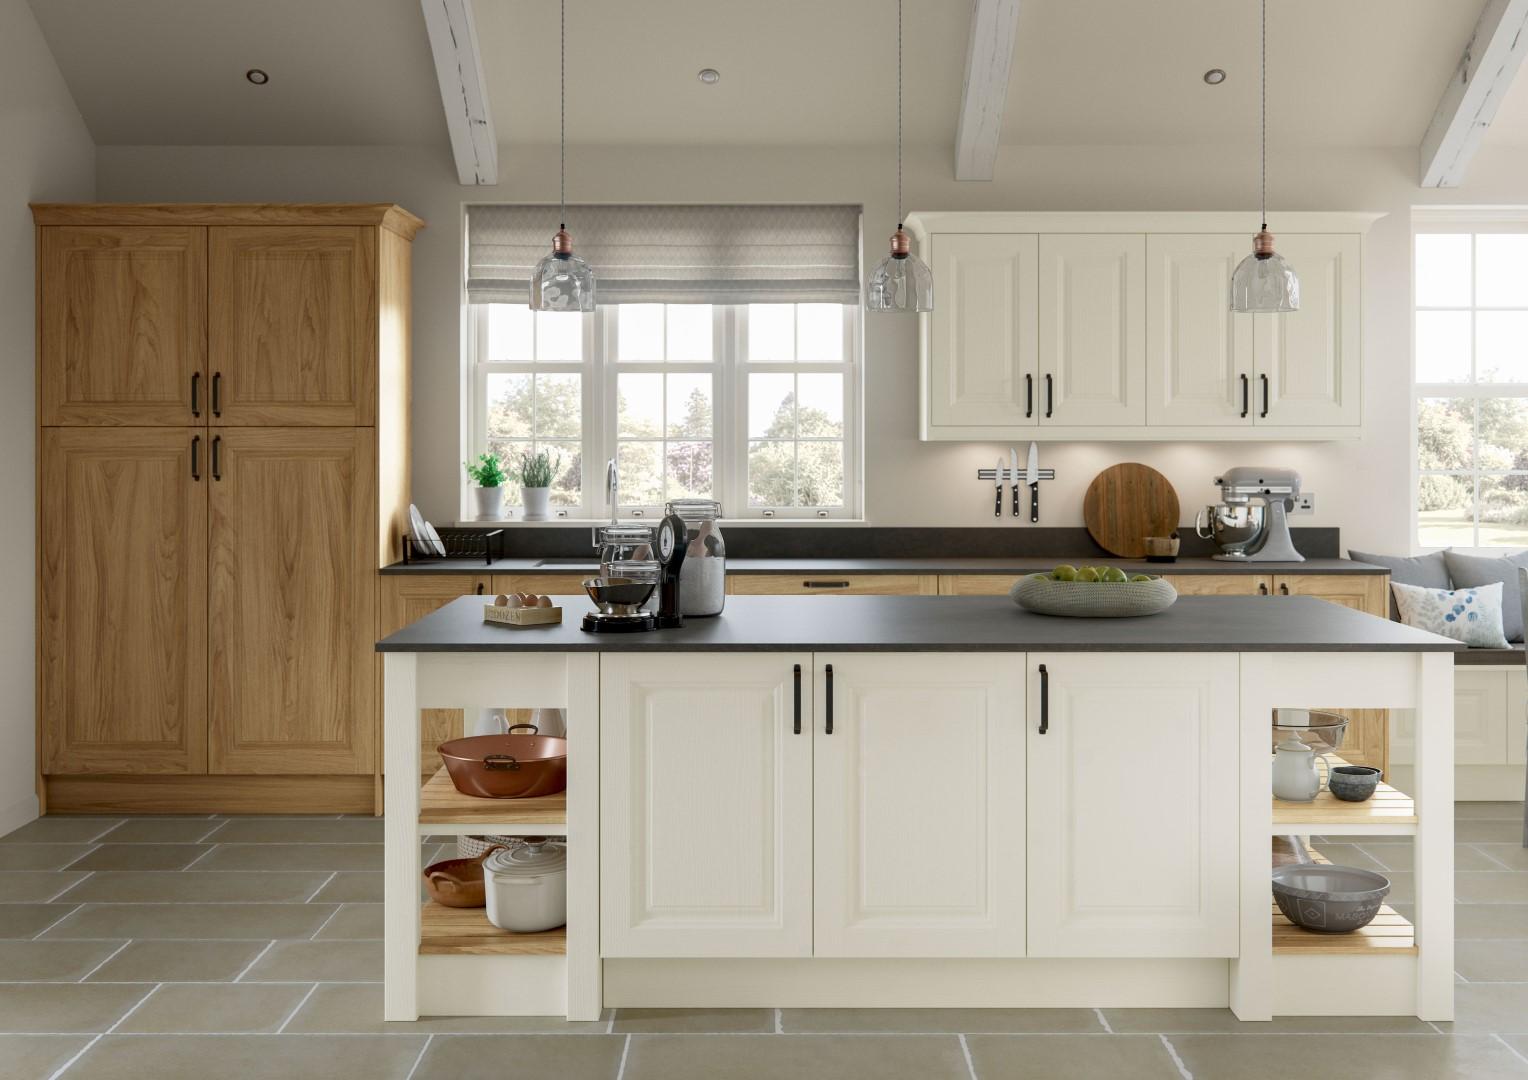 Jefferson Light Oak and Ivory Kitchen - Kitchen Design - Alan Kelly Kitchens - Waterford - 1